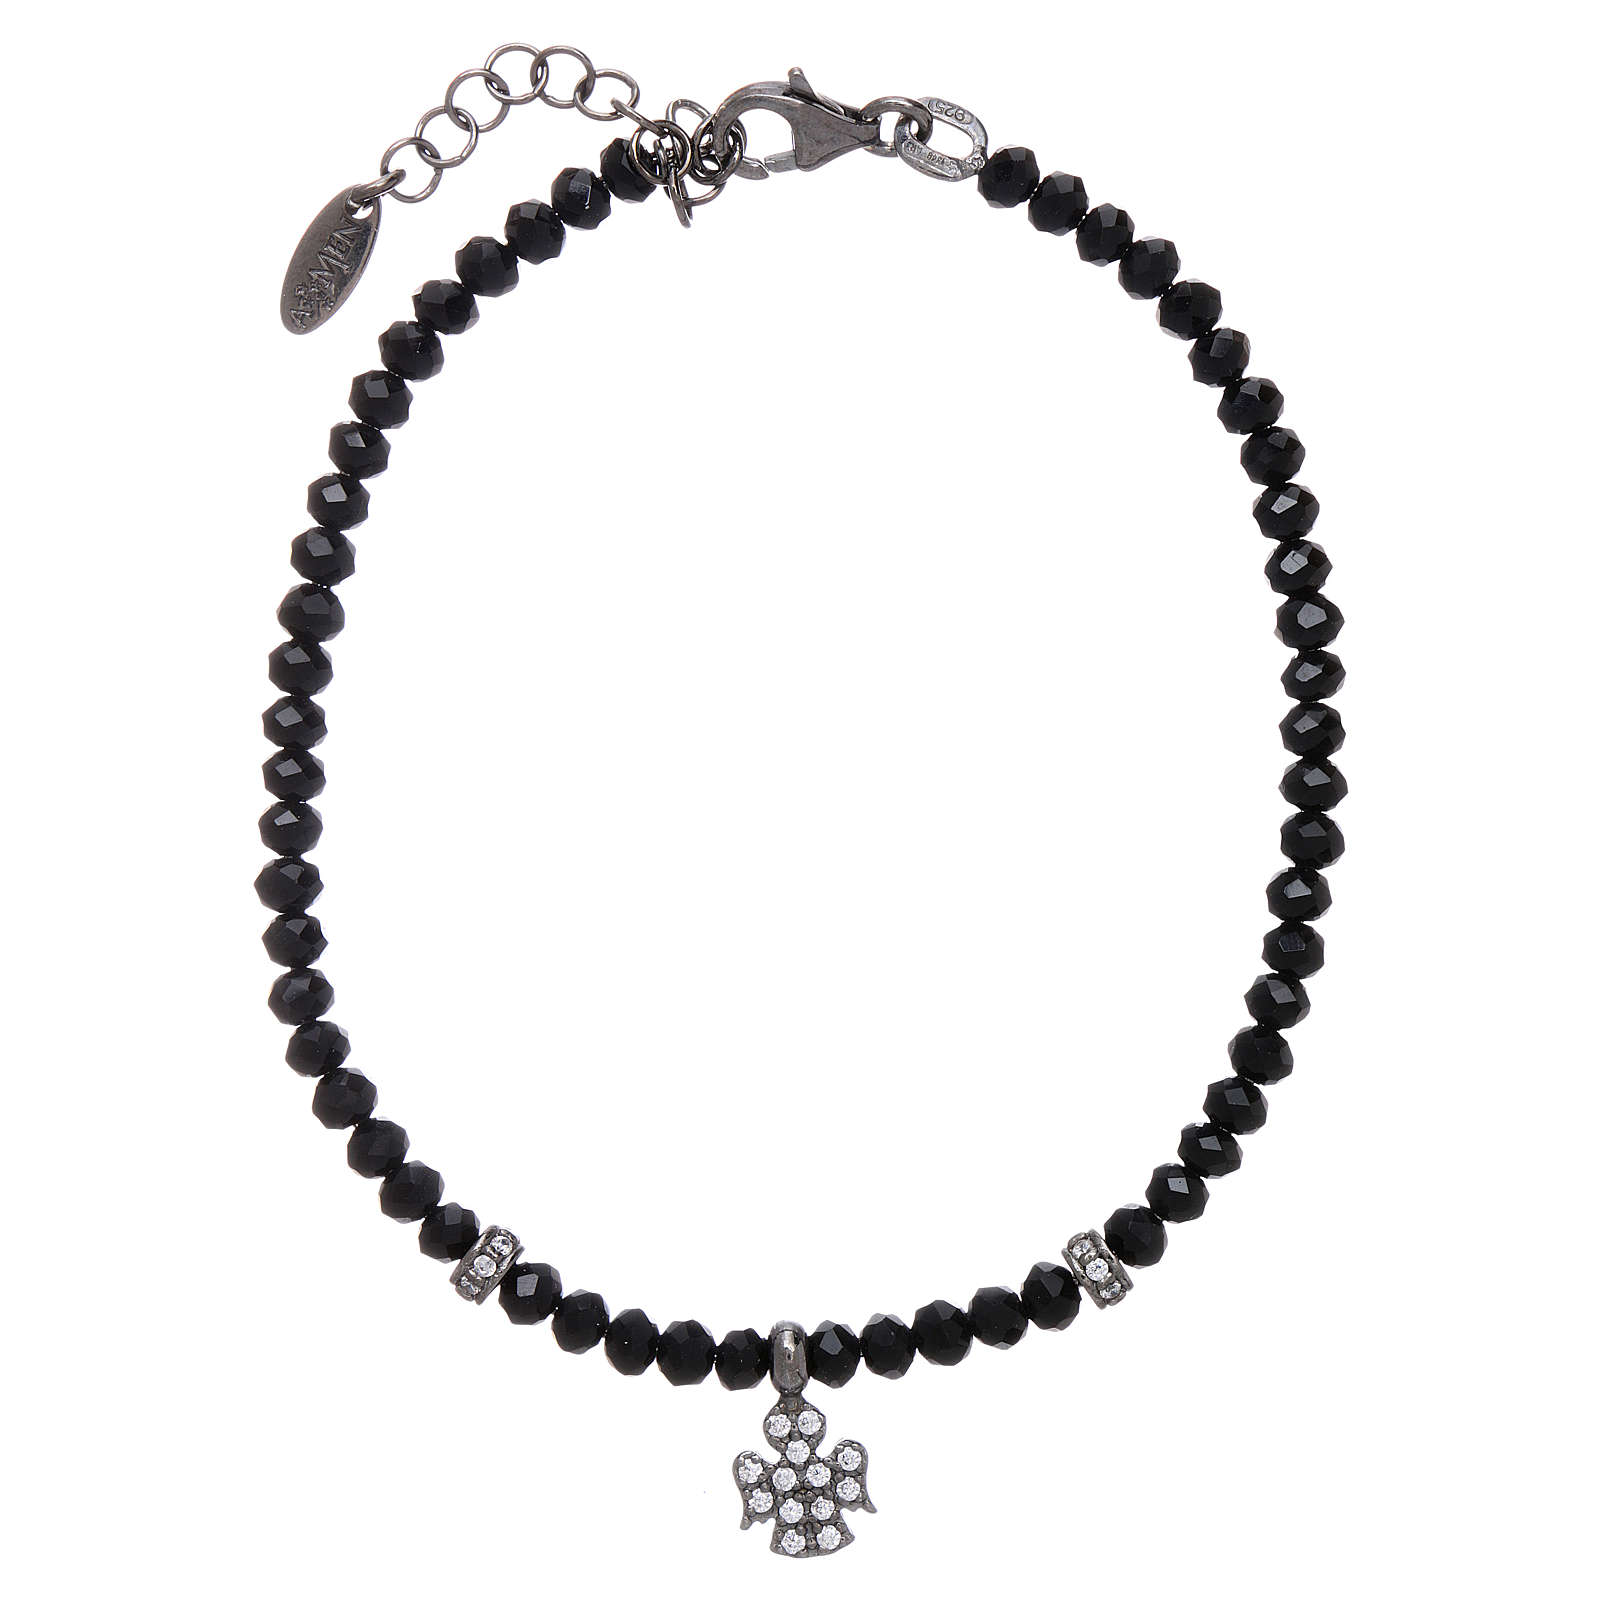 Bracciale AMEN Arg 925 cristalli neri angelo rodiato zirconato 4